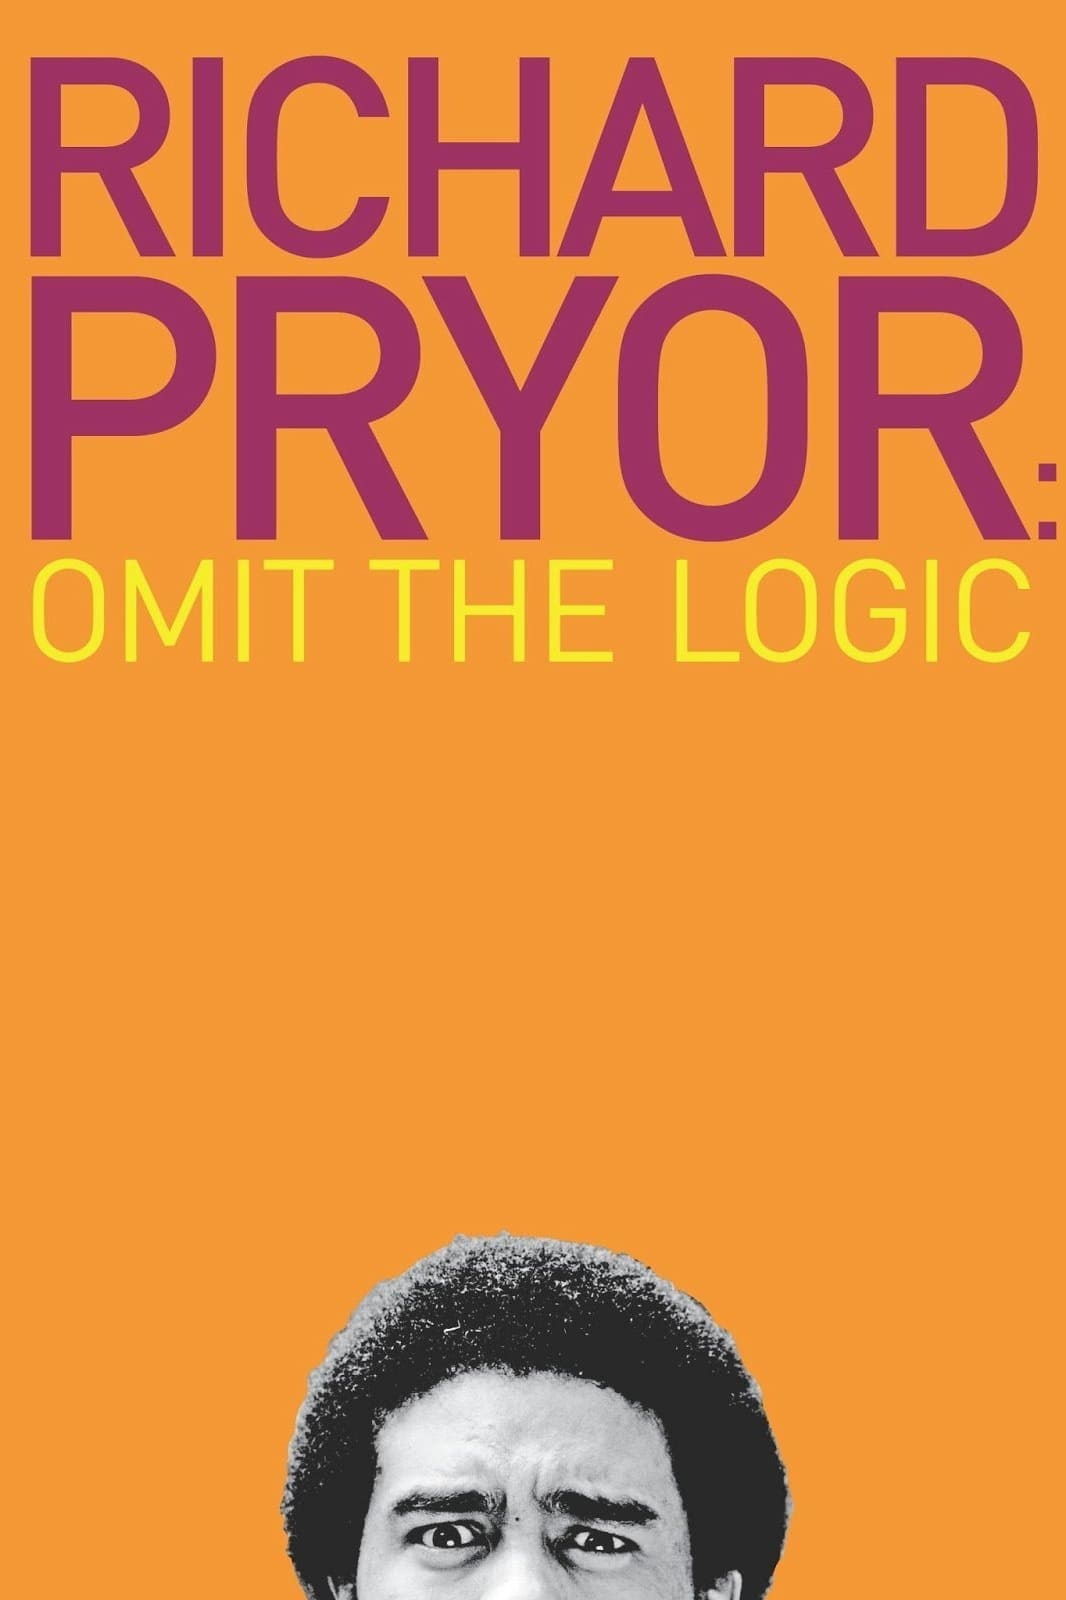 Richard Pryor: Omit the Logic (2013)